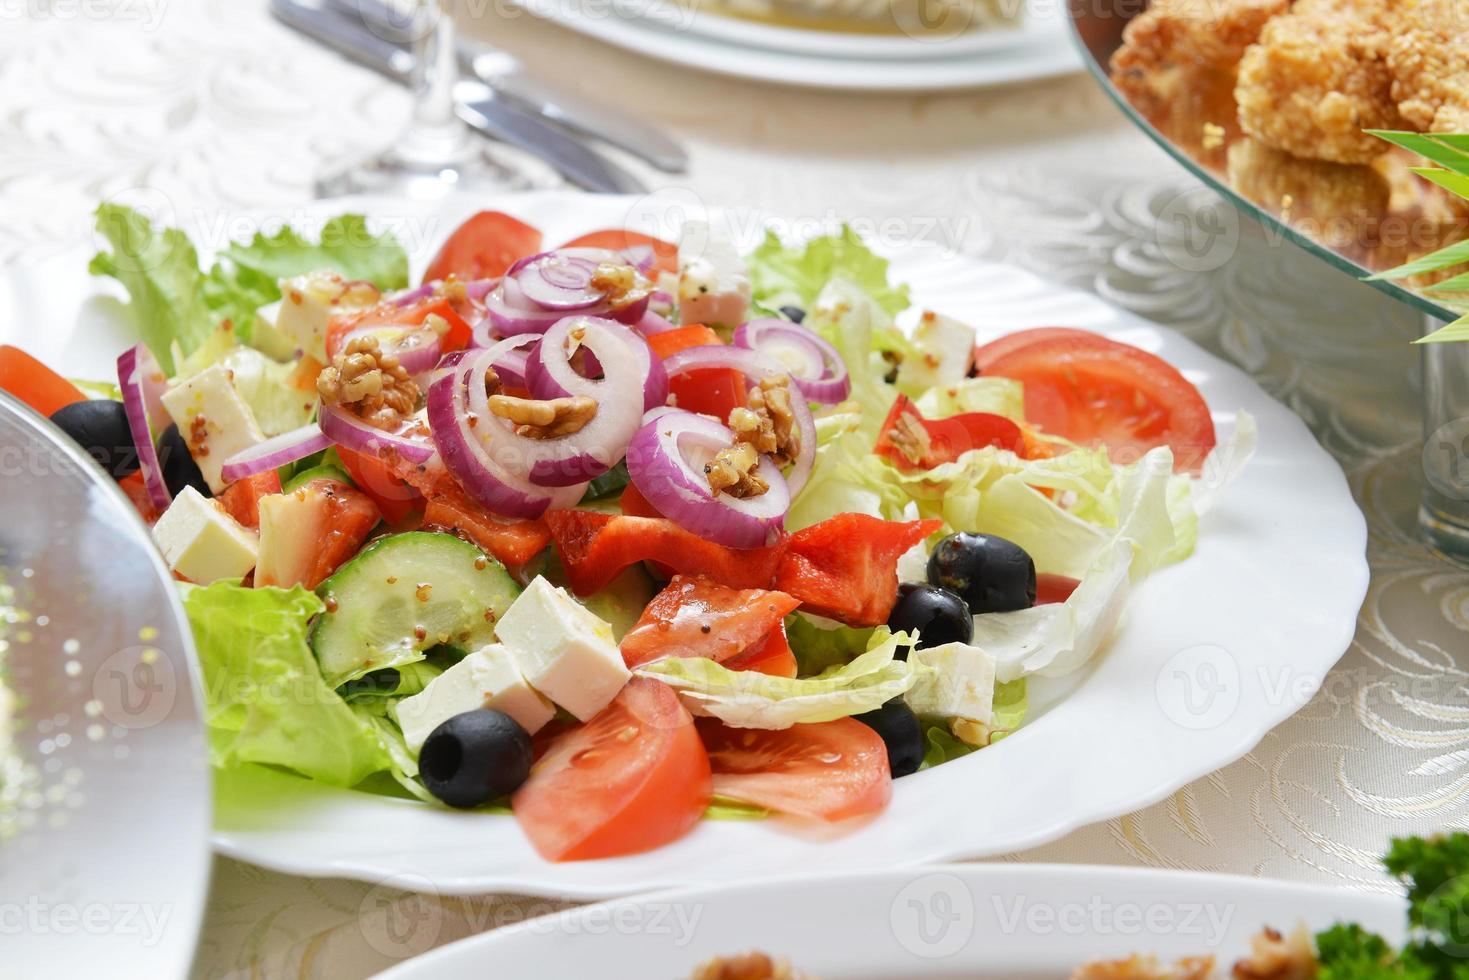 insalata con verdure fresche foto